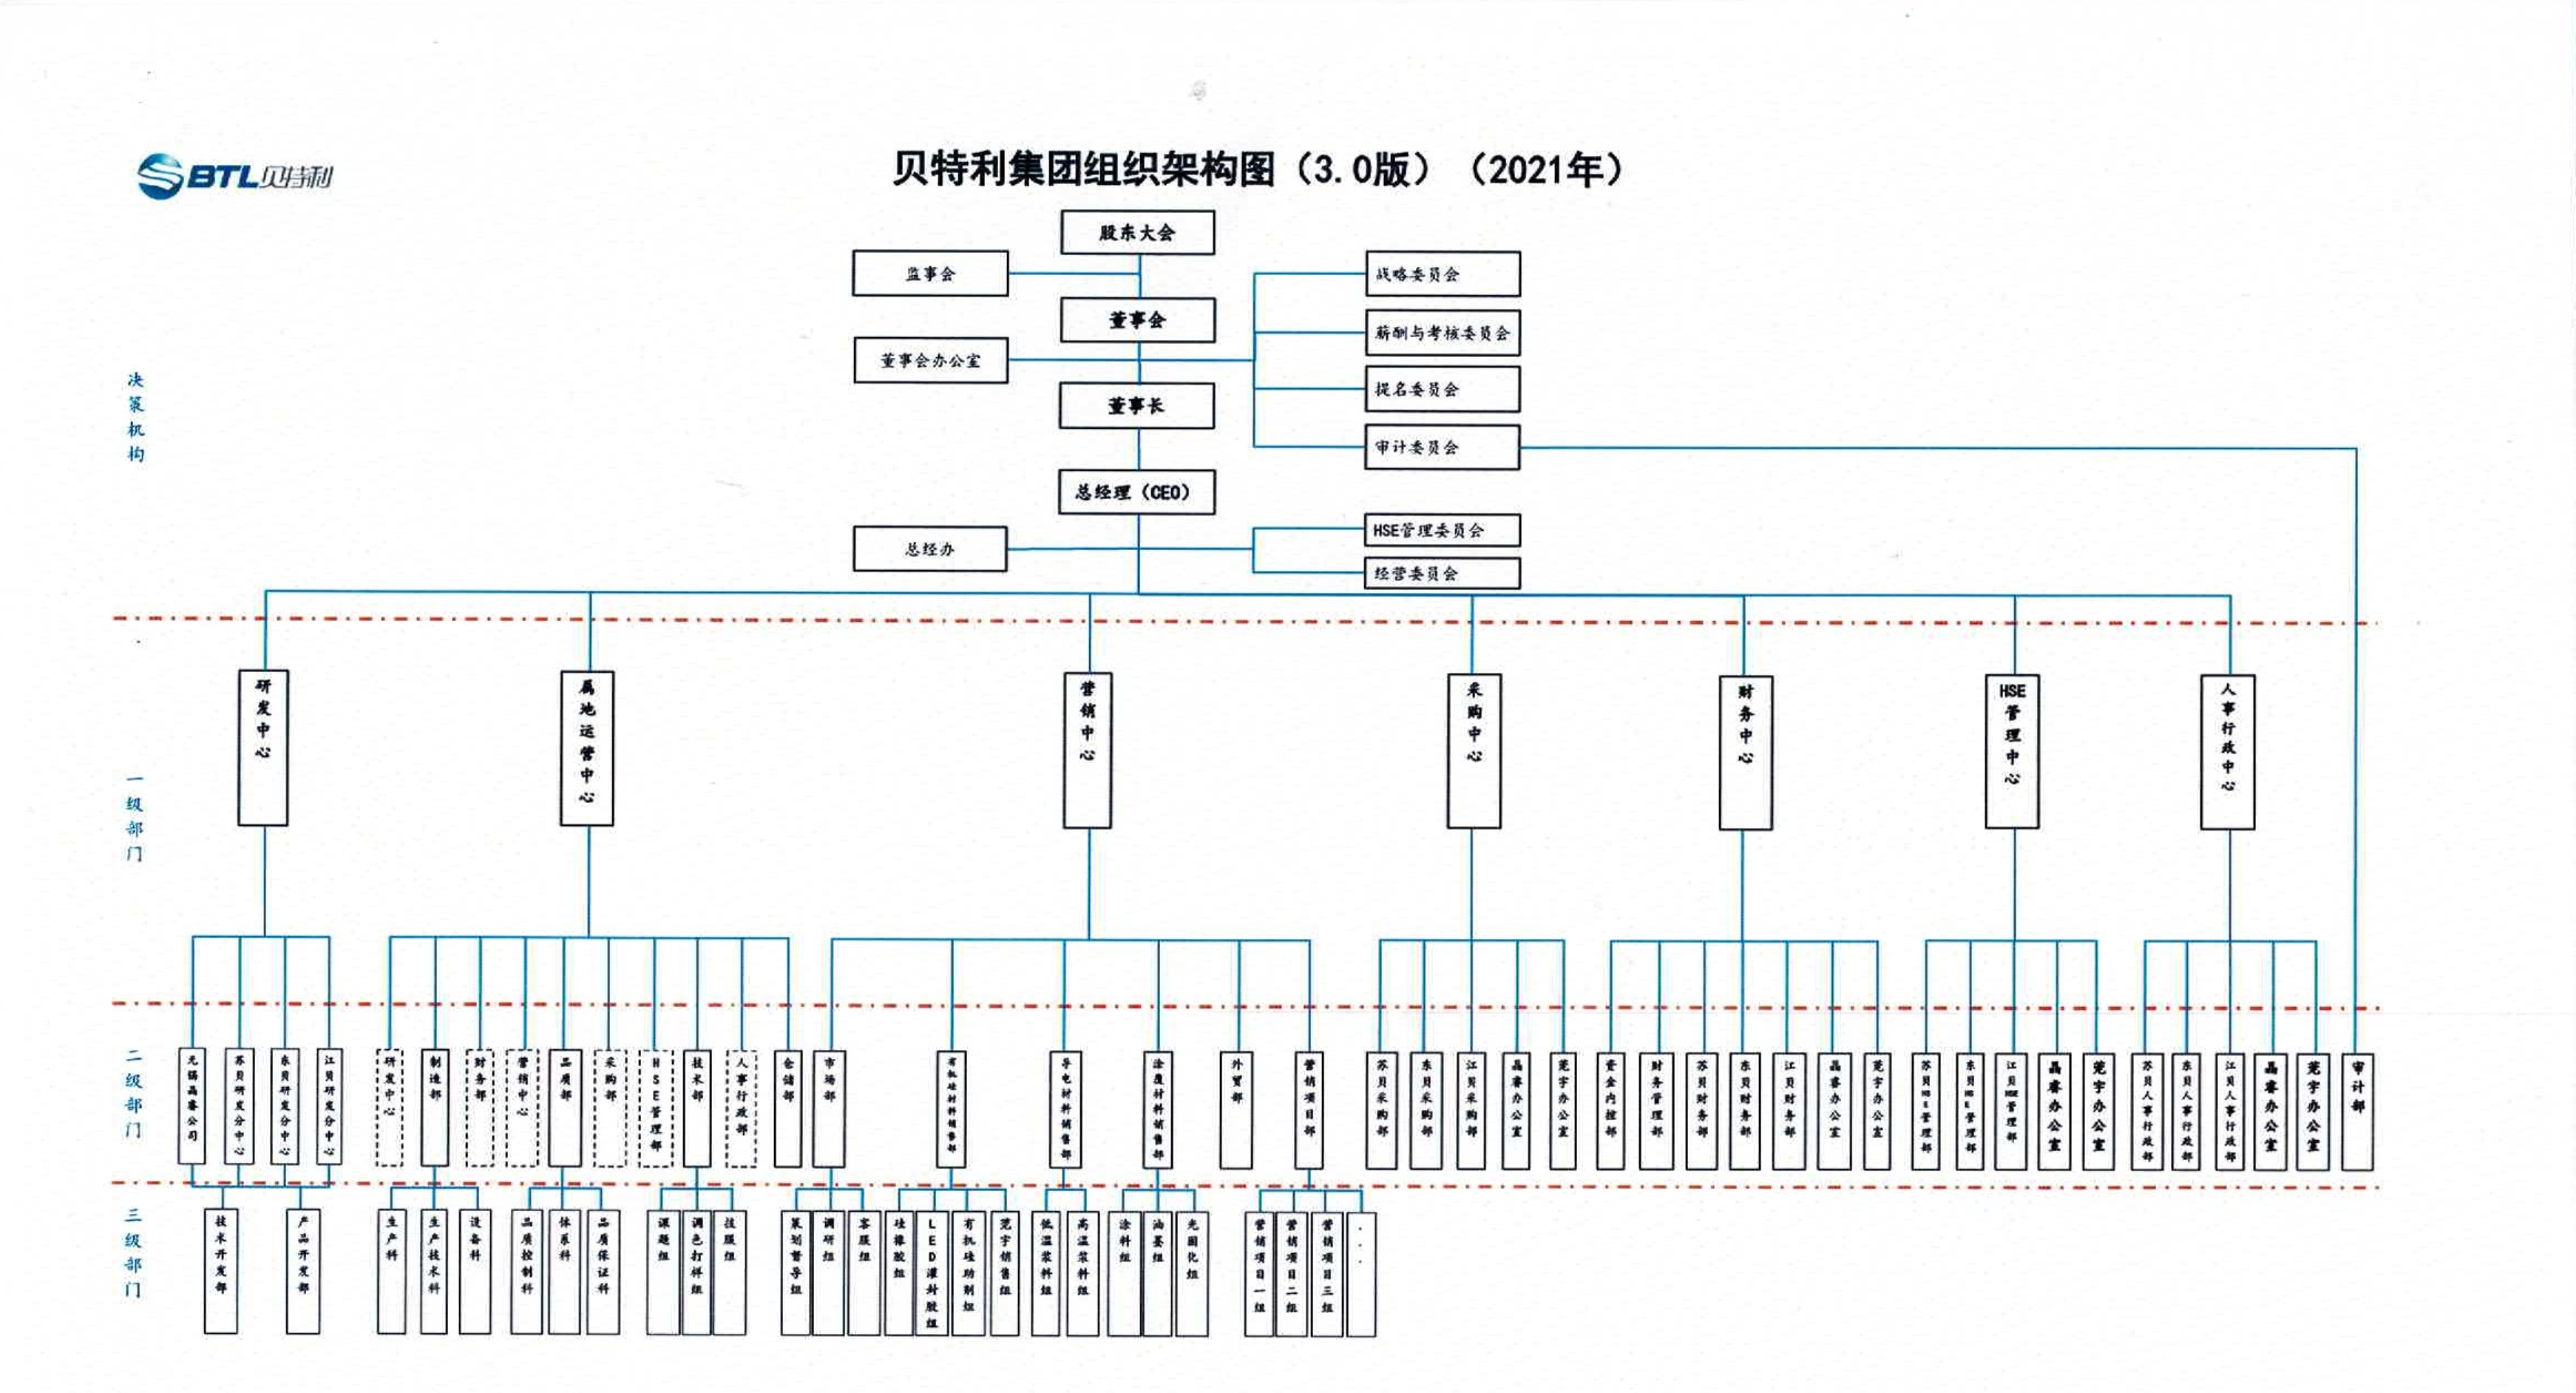 021916142411_0HR28贝特利集团组织架构图3.0版2021年_1.jpg